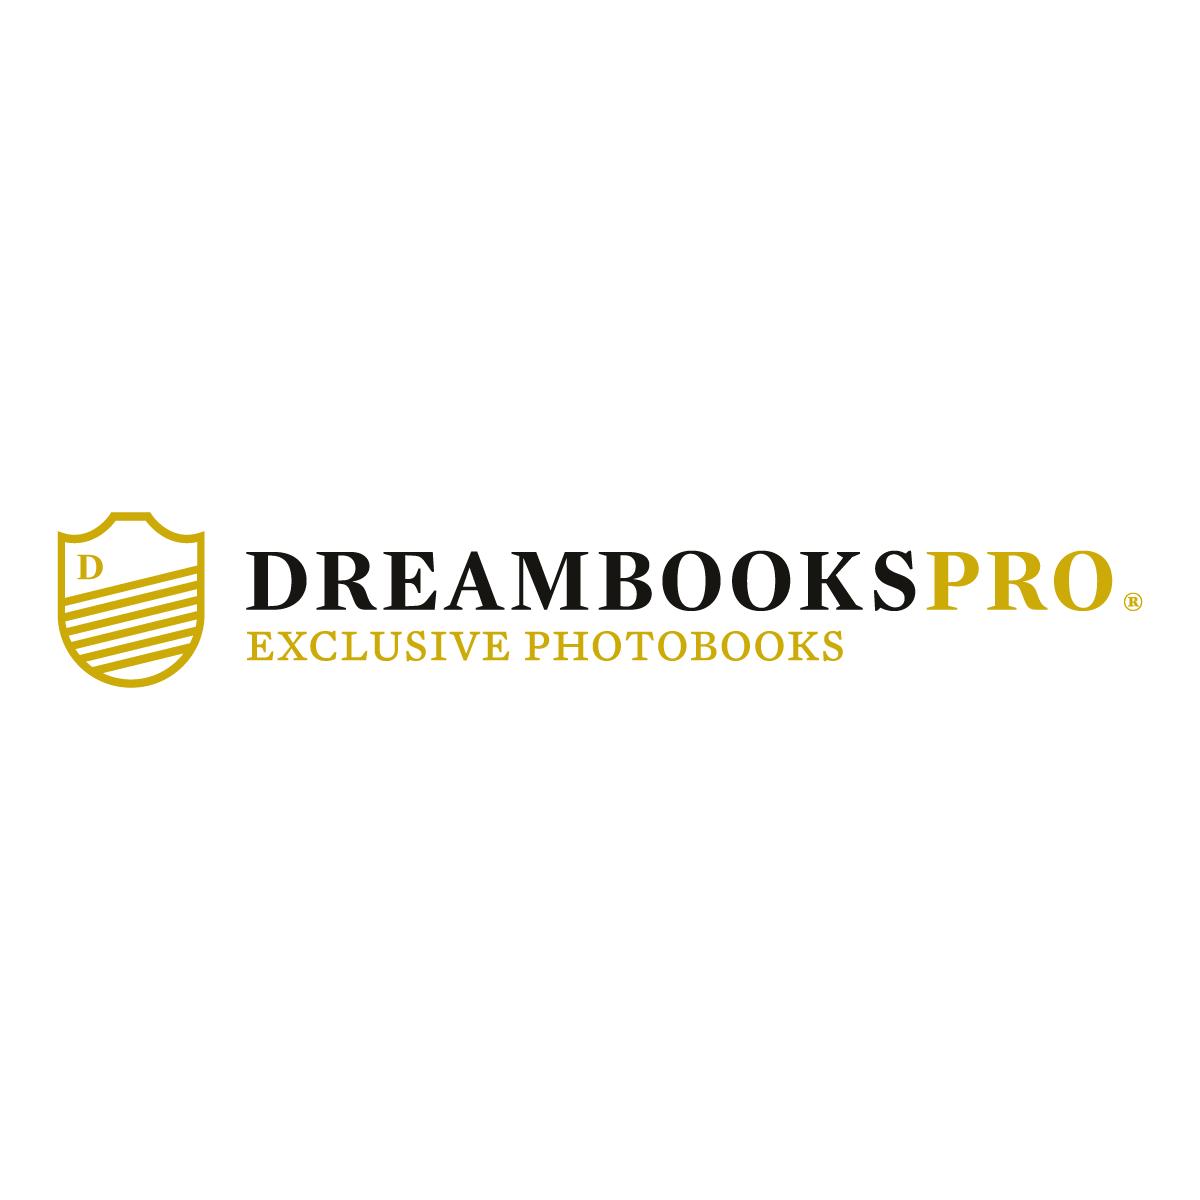 Dreambooks Pro  dreambookspro.com.br